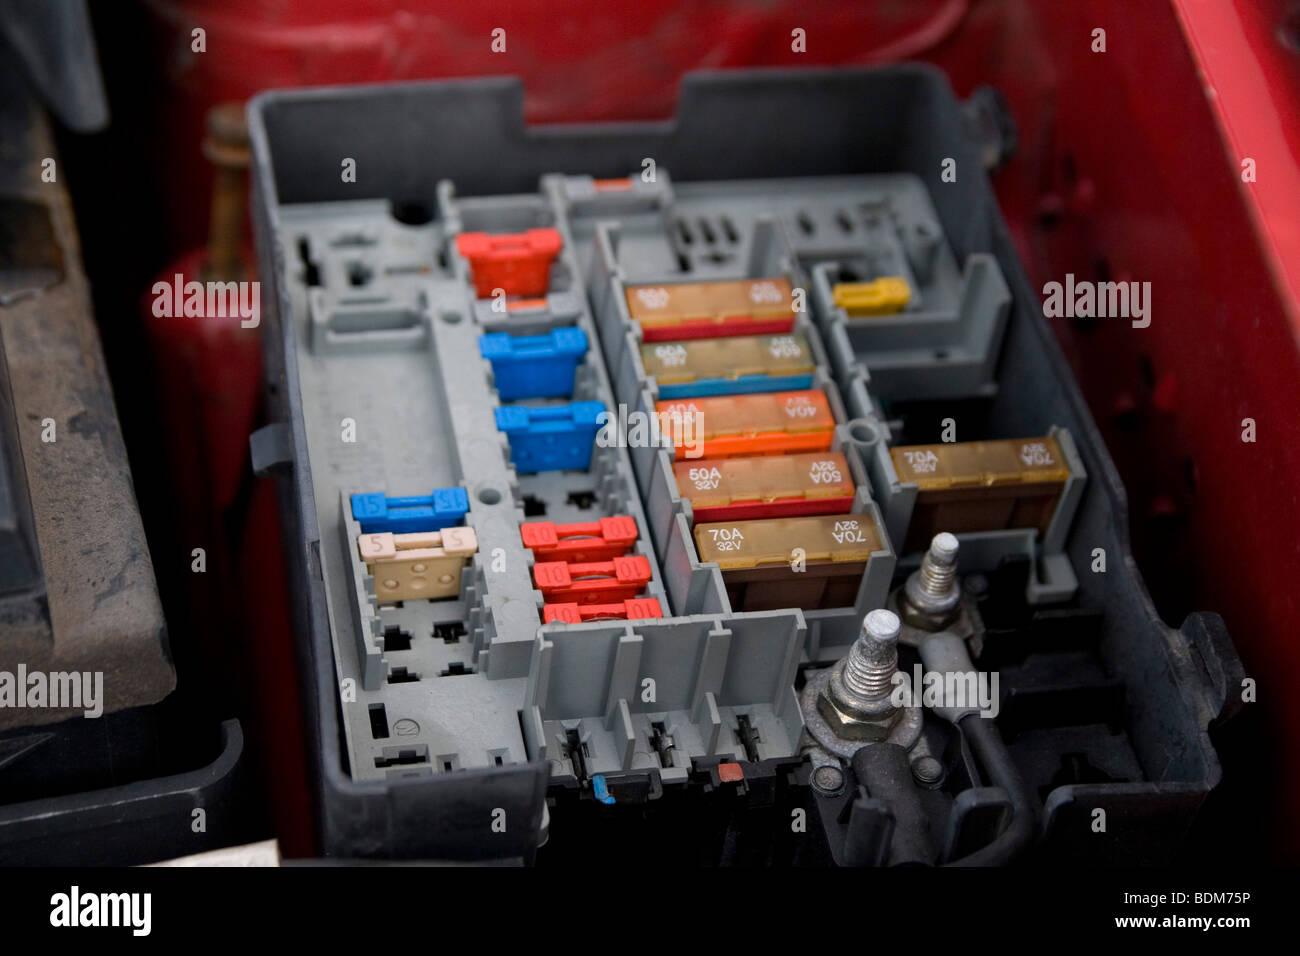 Fuse Box On A Citroen Berlingo Auto Electrical Wiring Diagram 95 Ford  Explorer Fuse Box Diagram Citroen Fuse Box